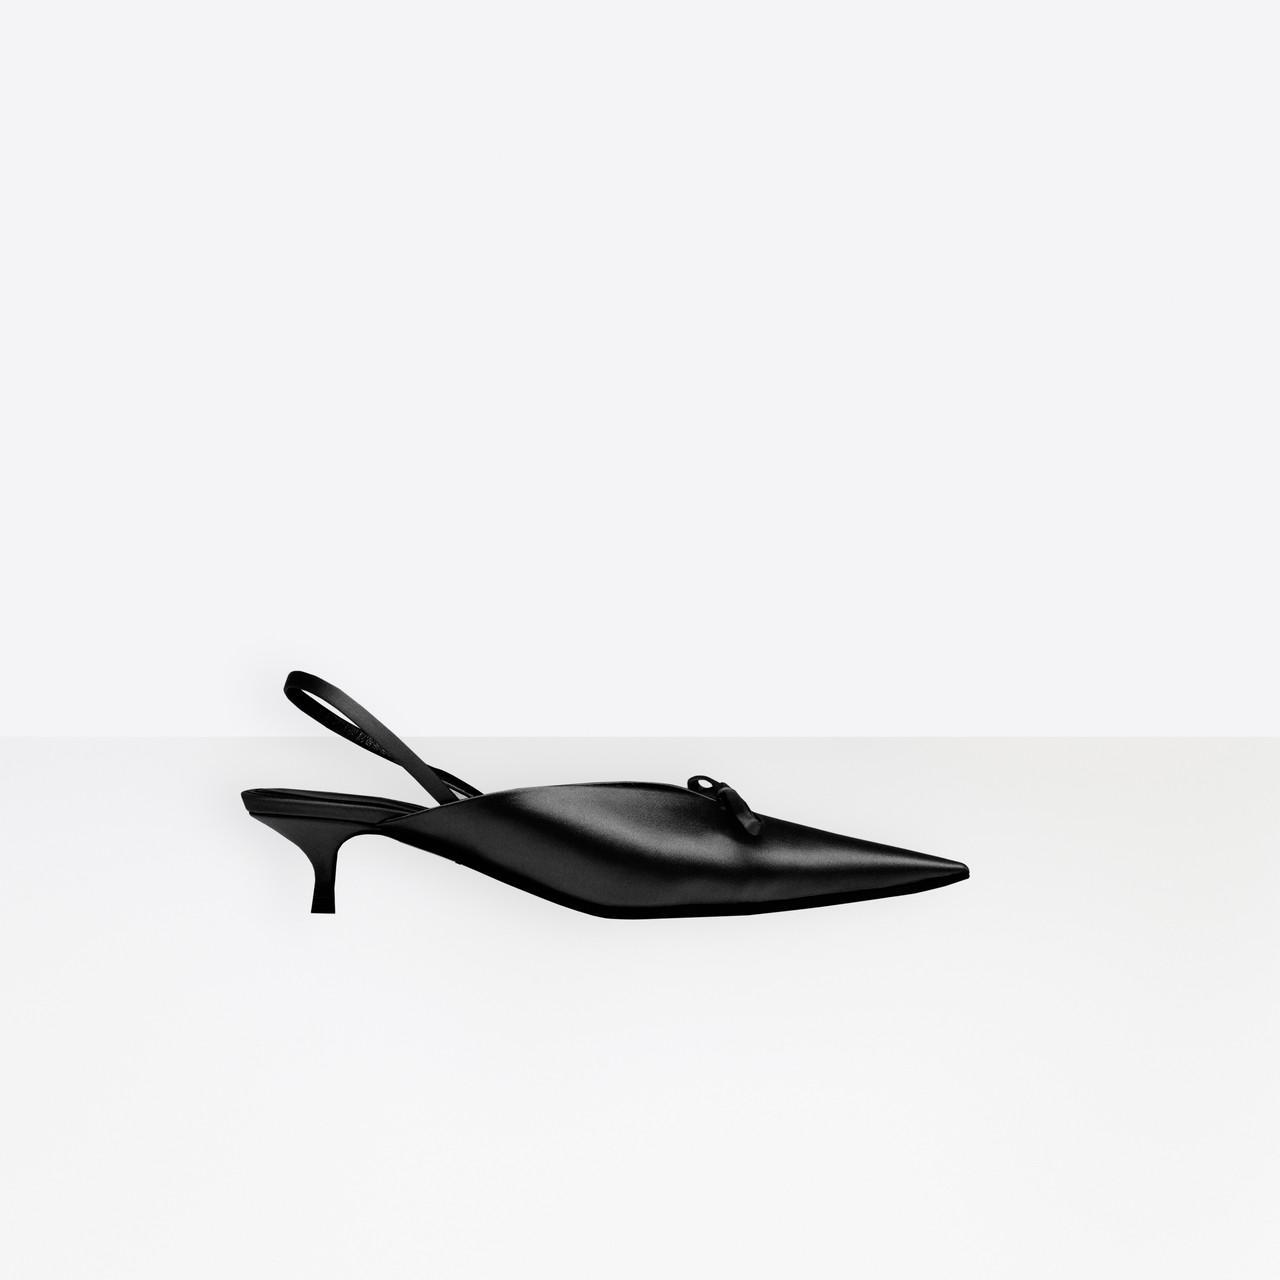 e0d6d6d5474b Lyst - Balenciaga Knife Slingback Mules in Black